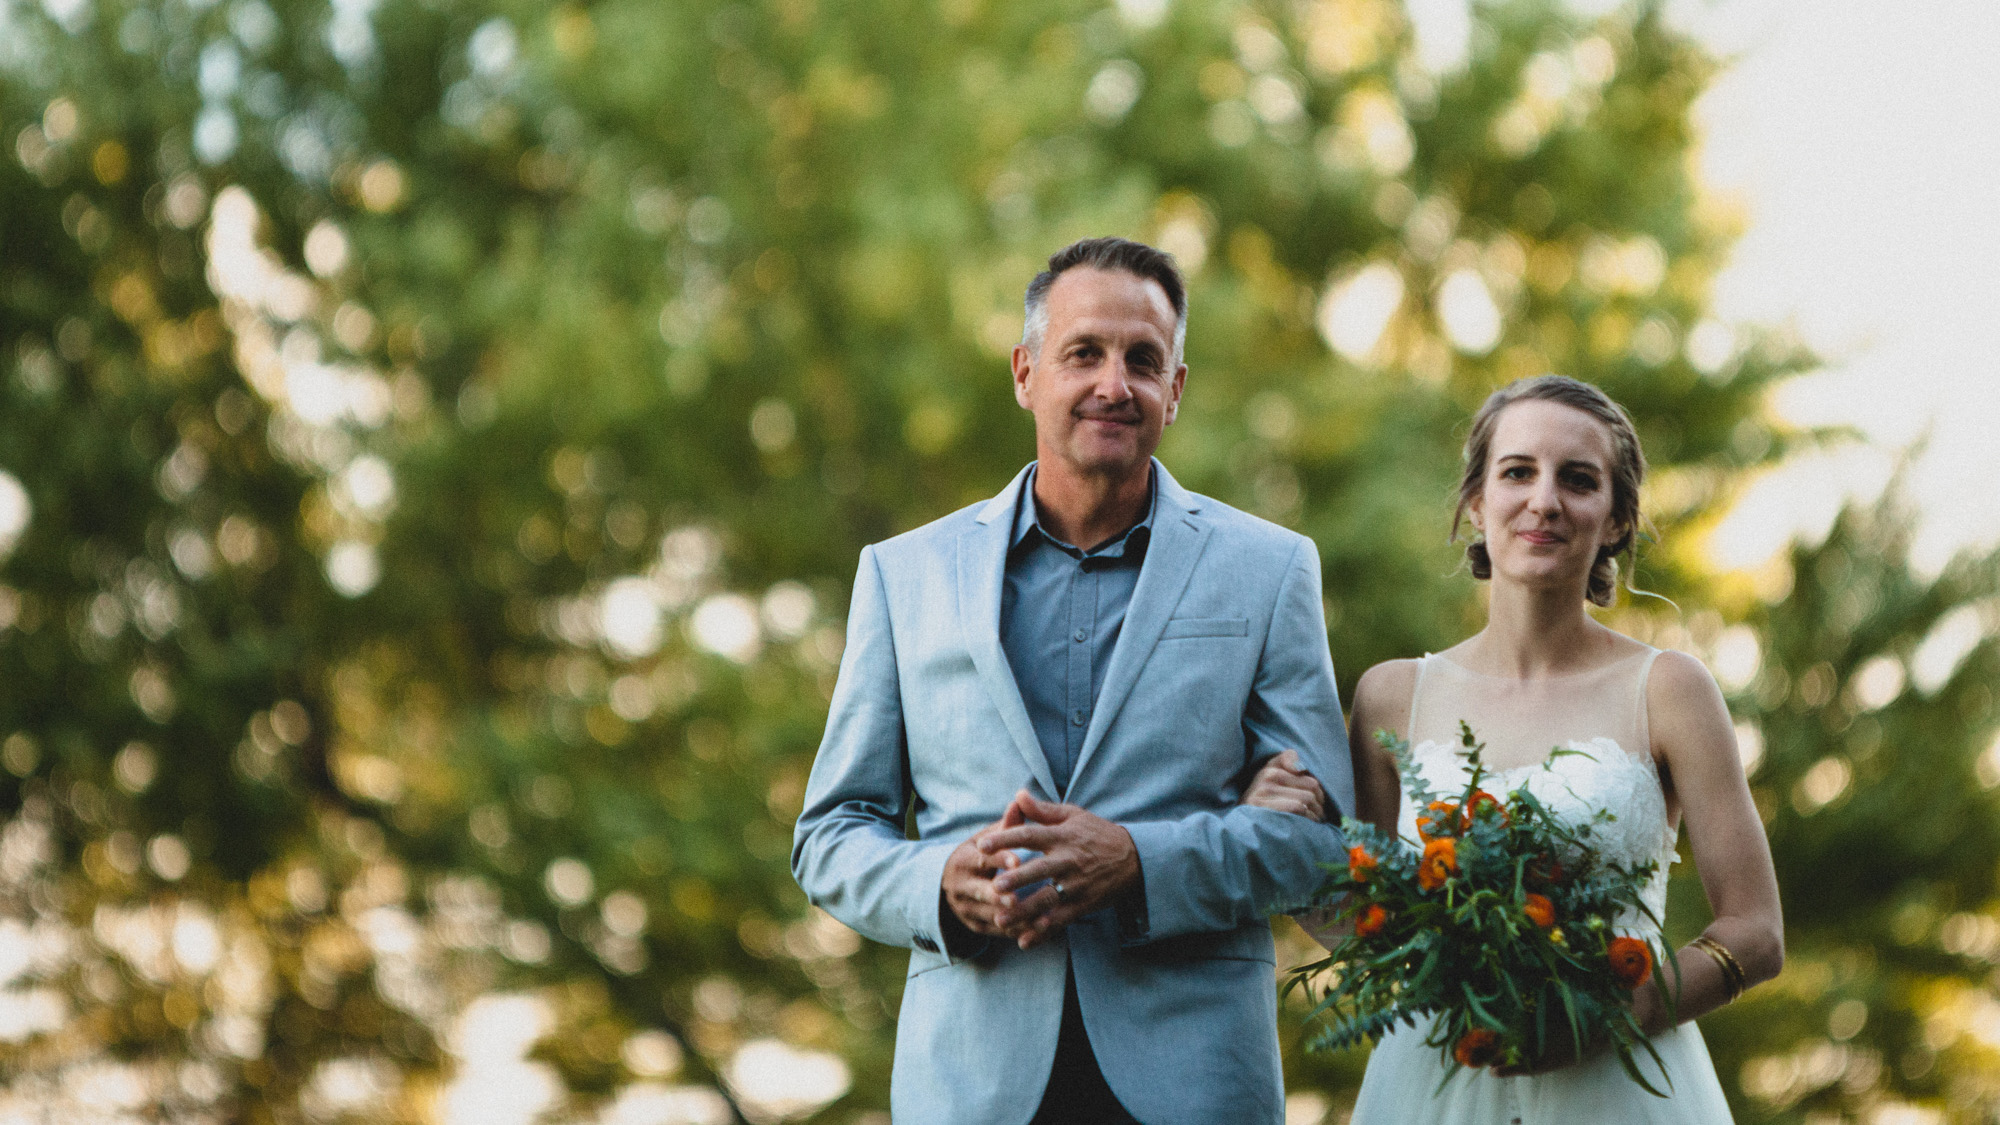 alec_vanderboom_springfield_missouri_wedding-0066.jpg